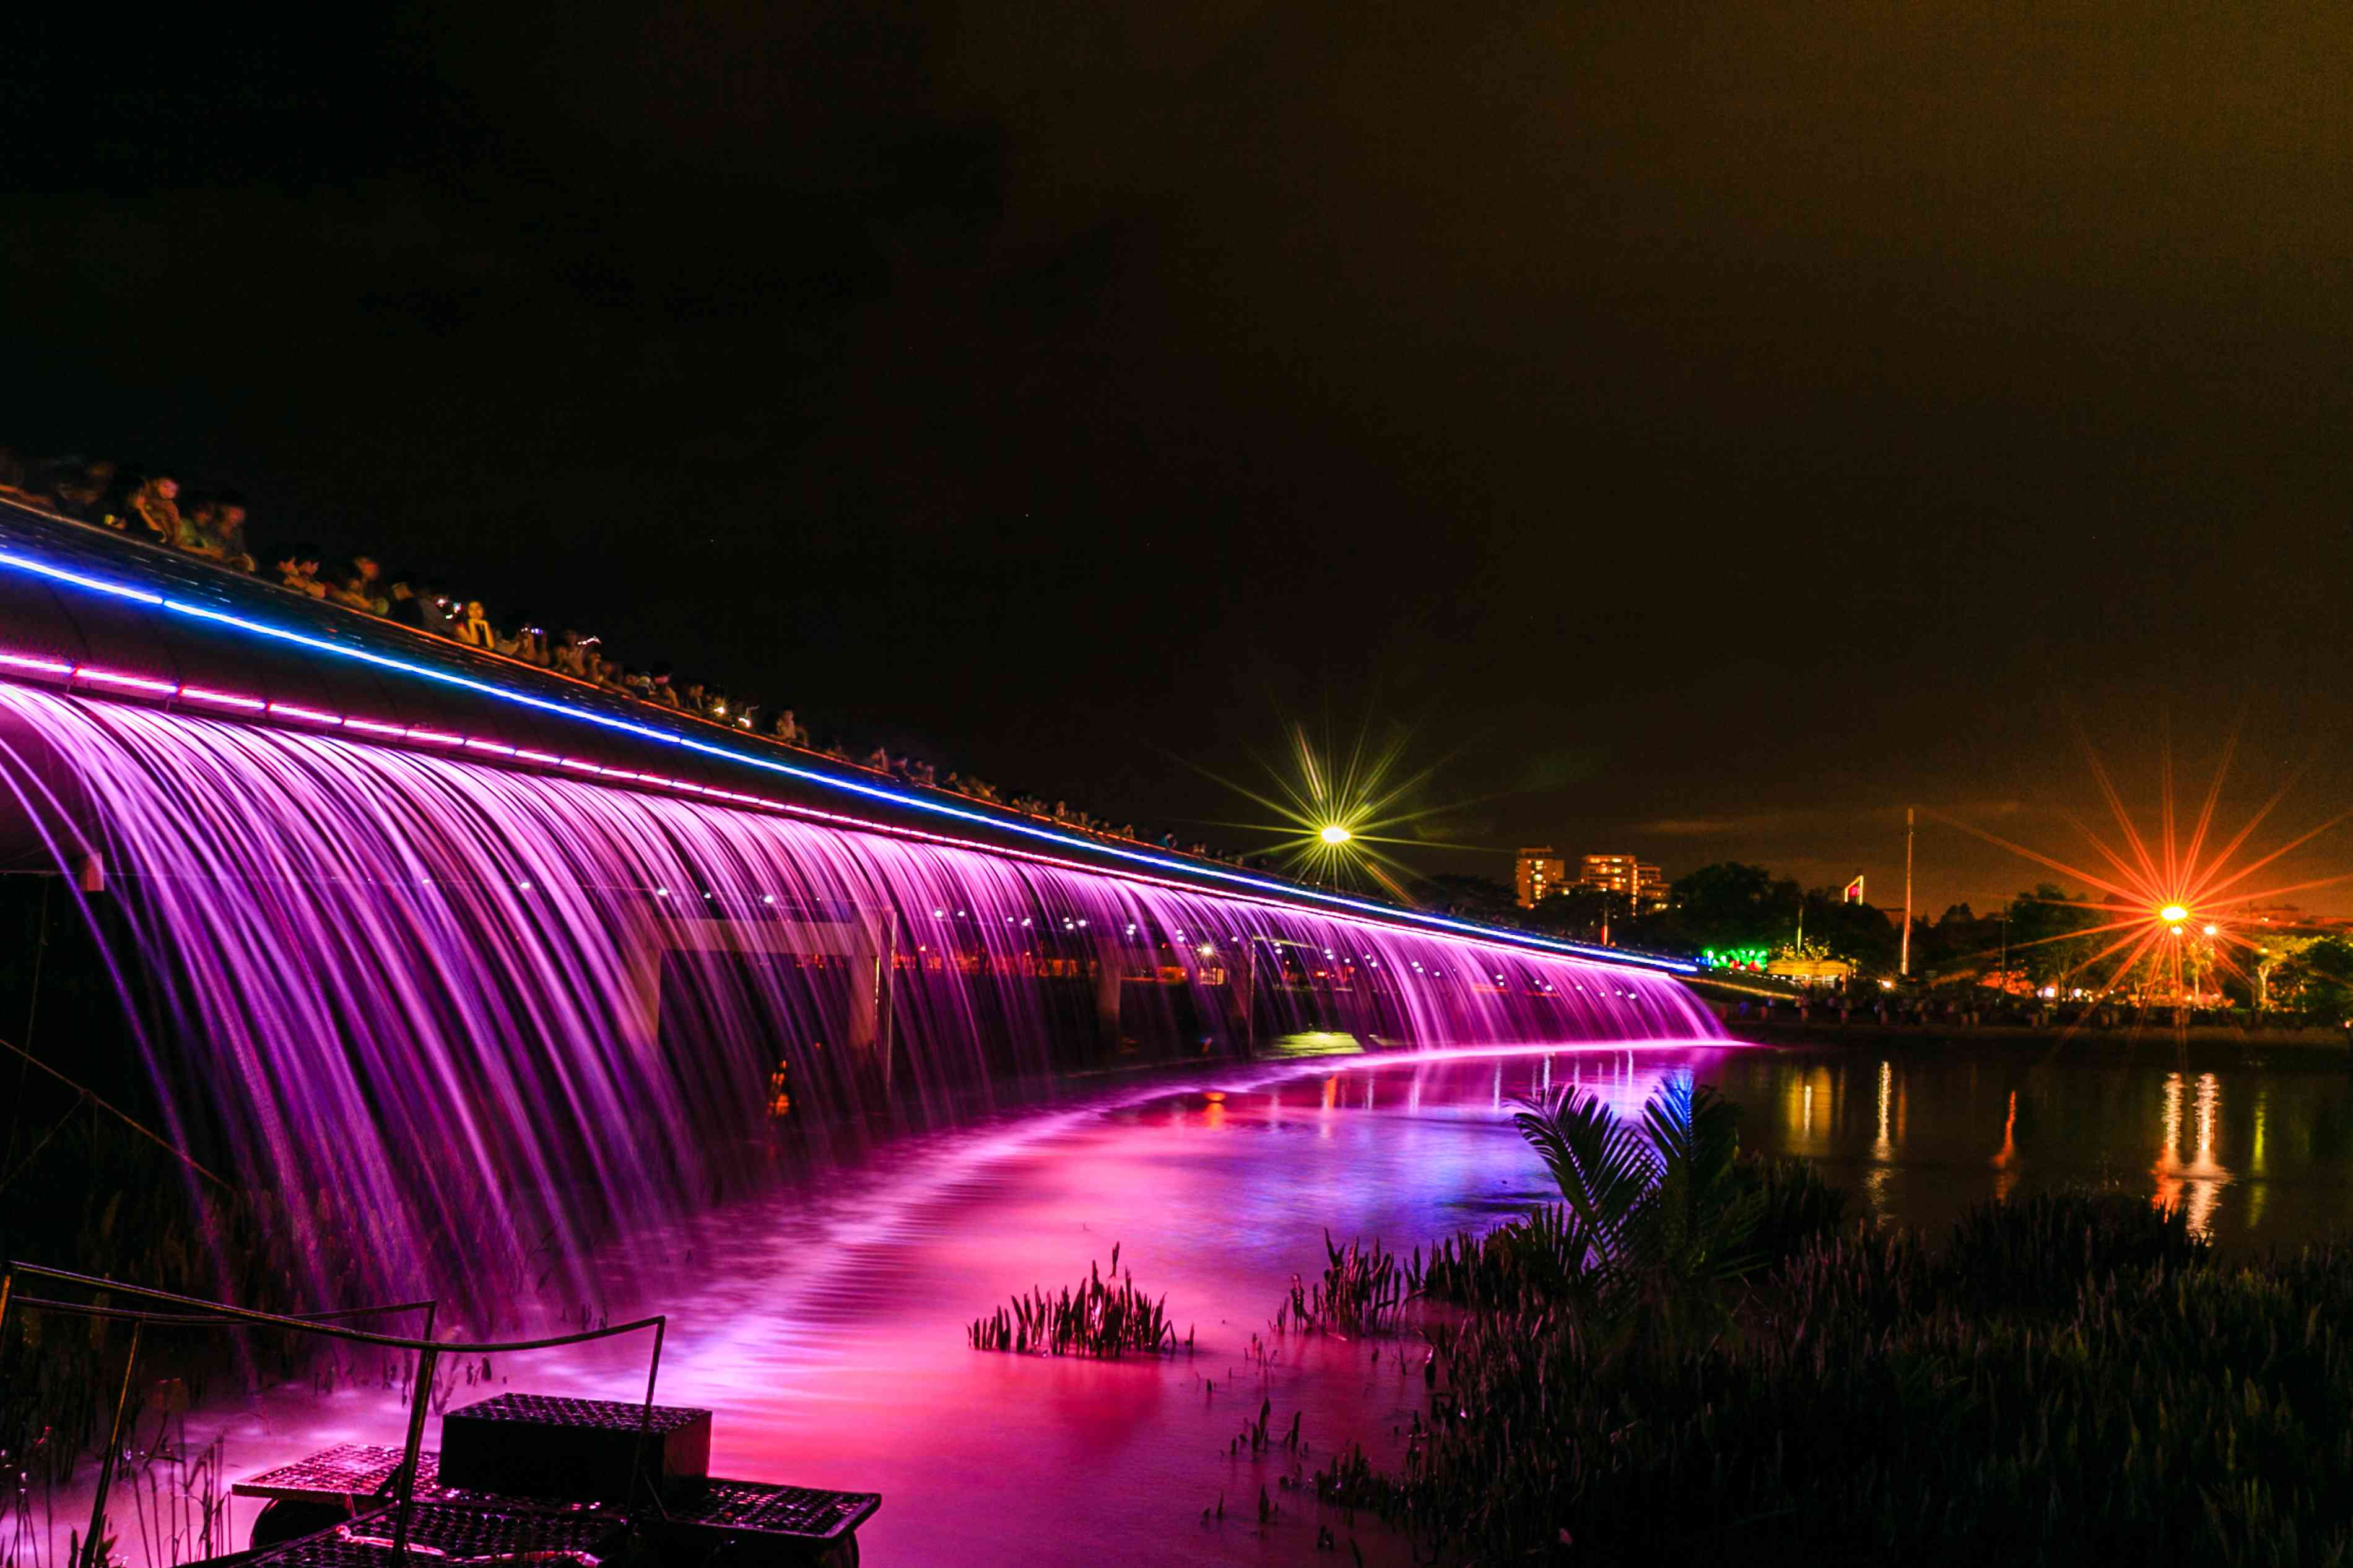 Starlight Bridge illuminated outside Crescent Mall in Ho Chi Minh City